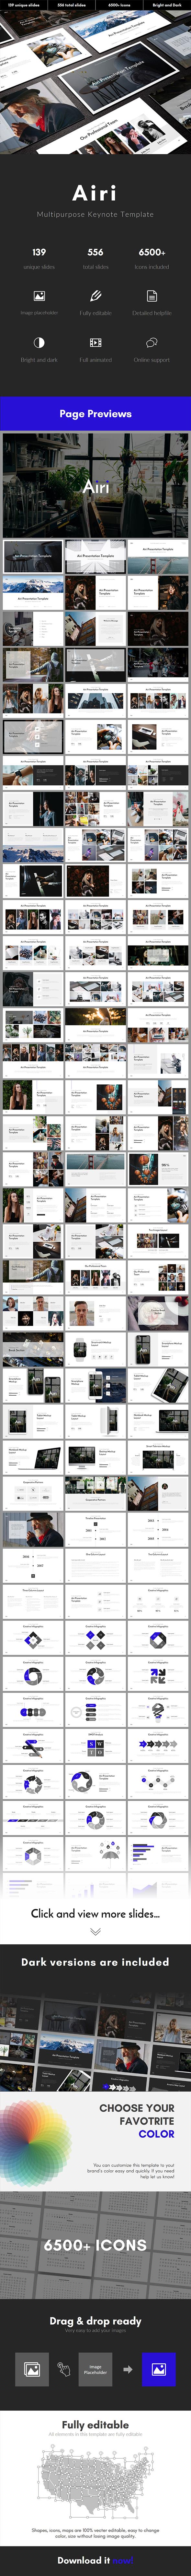 Airi Multipurpose Keynote Template - Business Keynote Templates